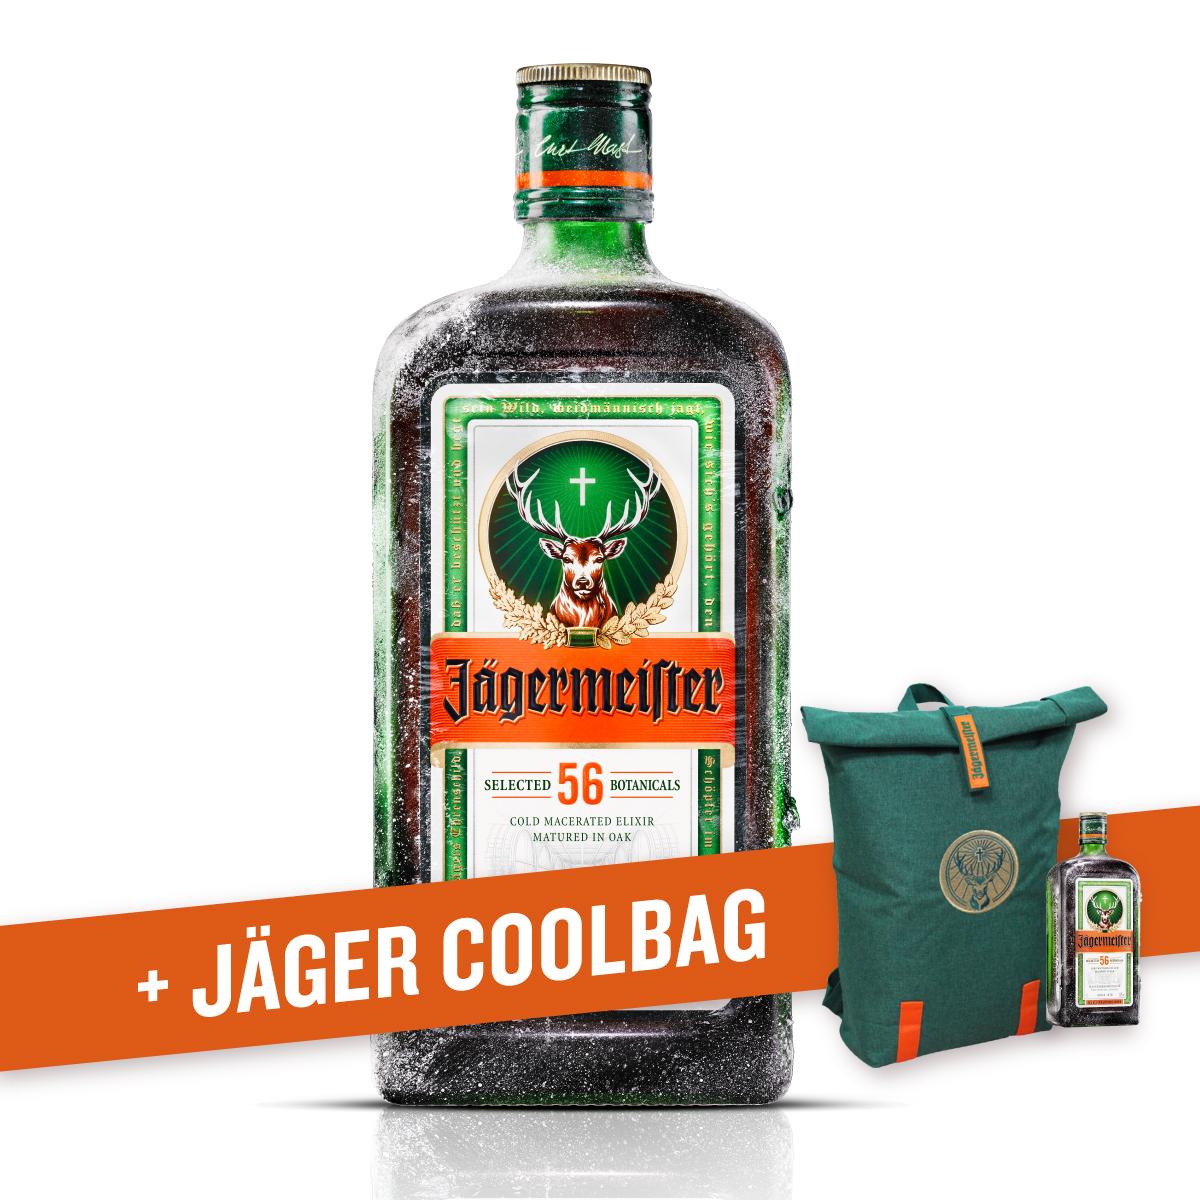 Amaro Jägermeister (70 cl) con Coolbag!